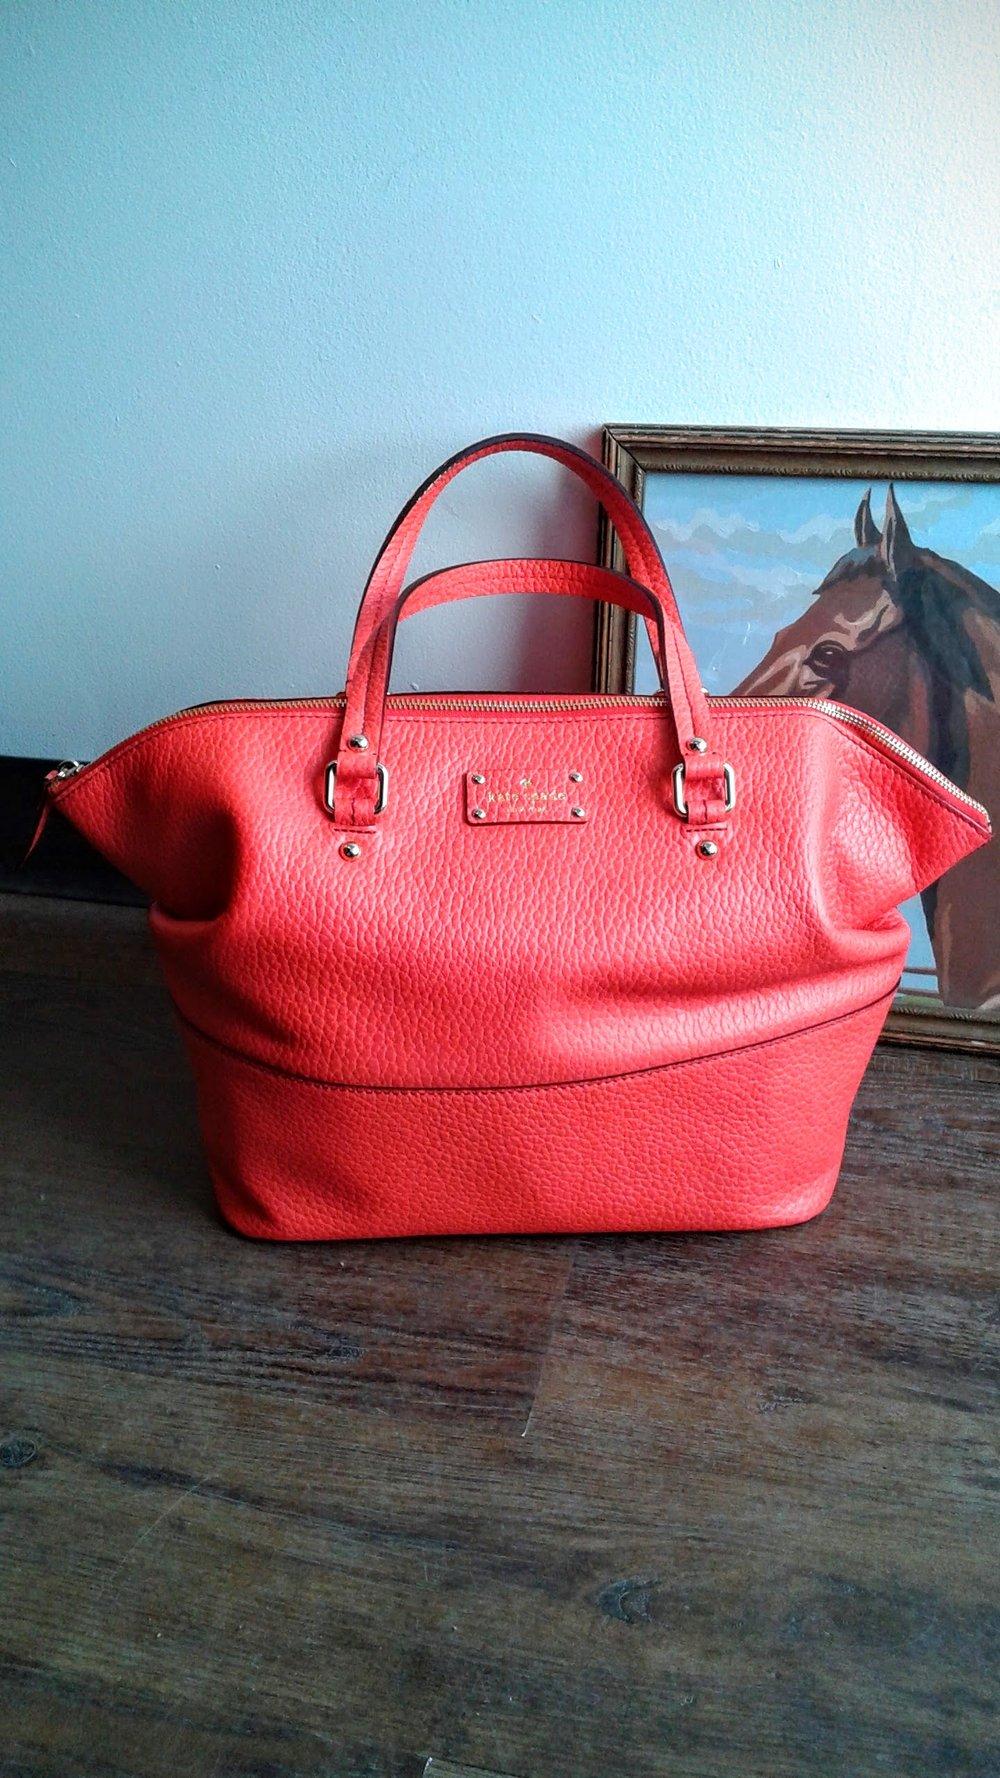 Kate Spade purse, $185